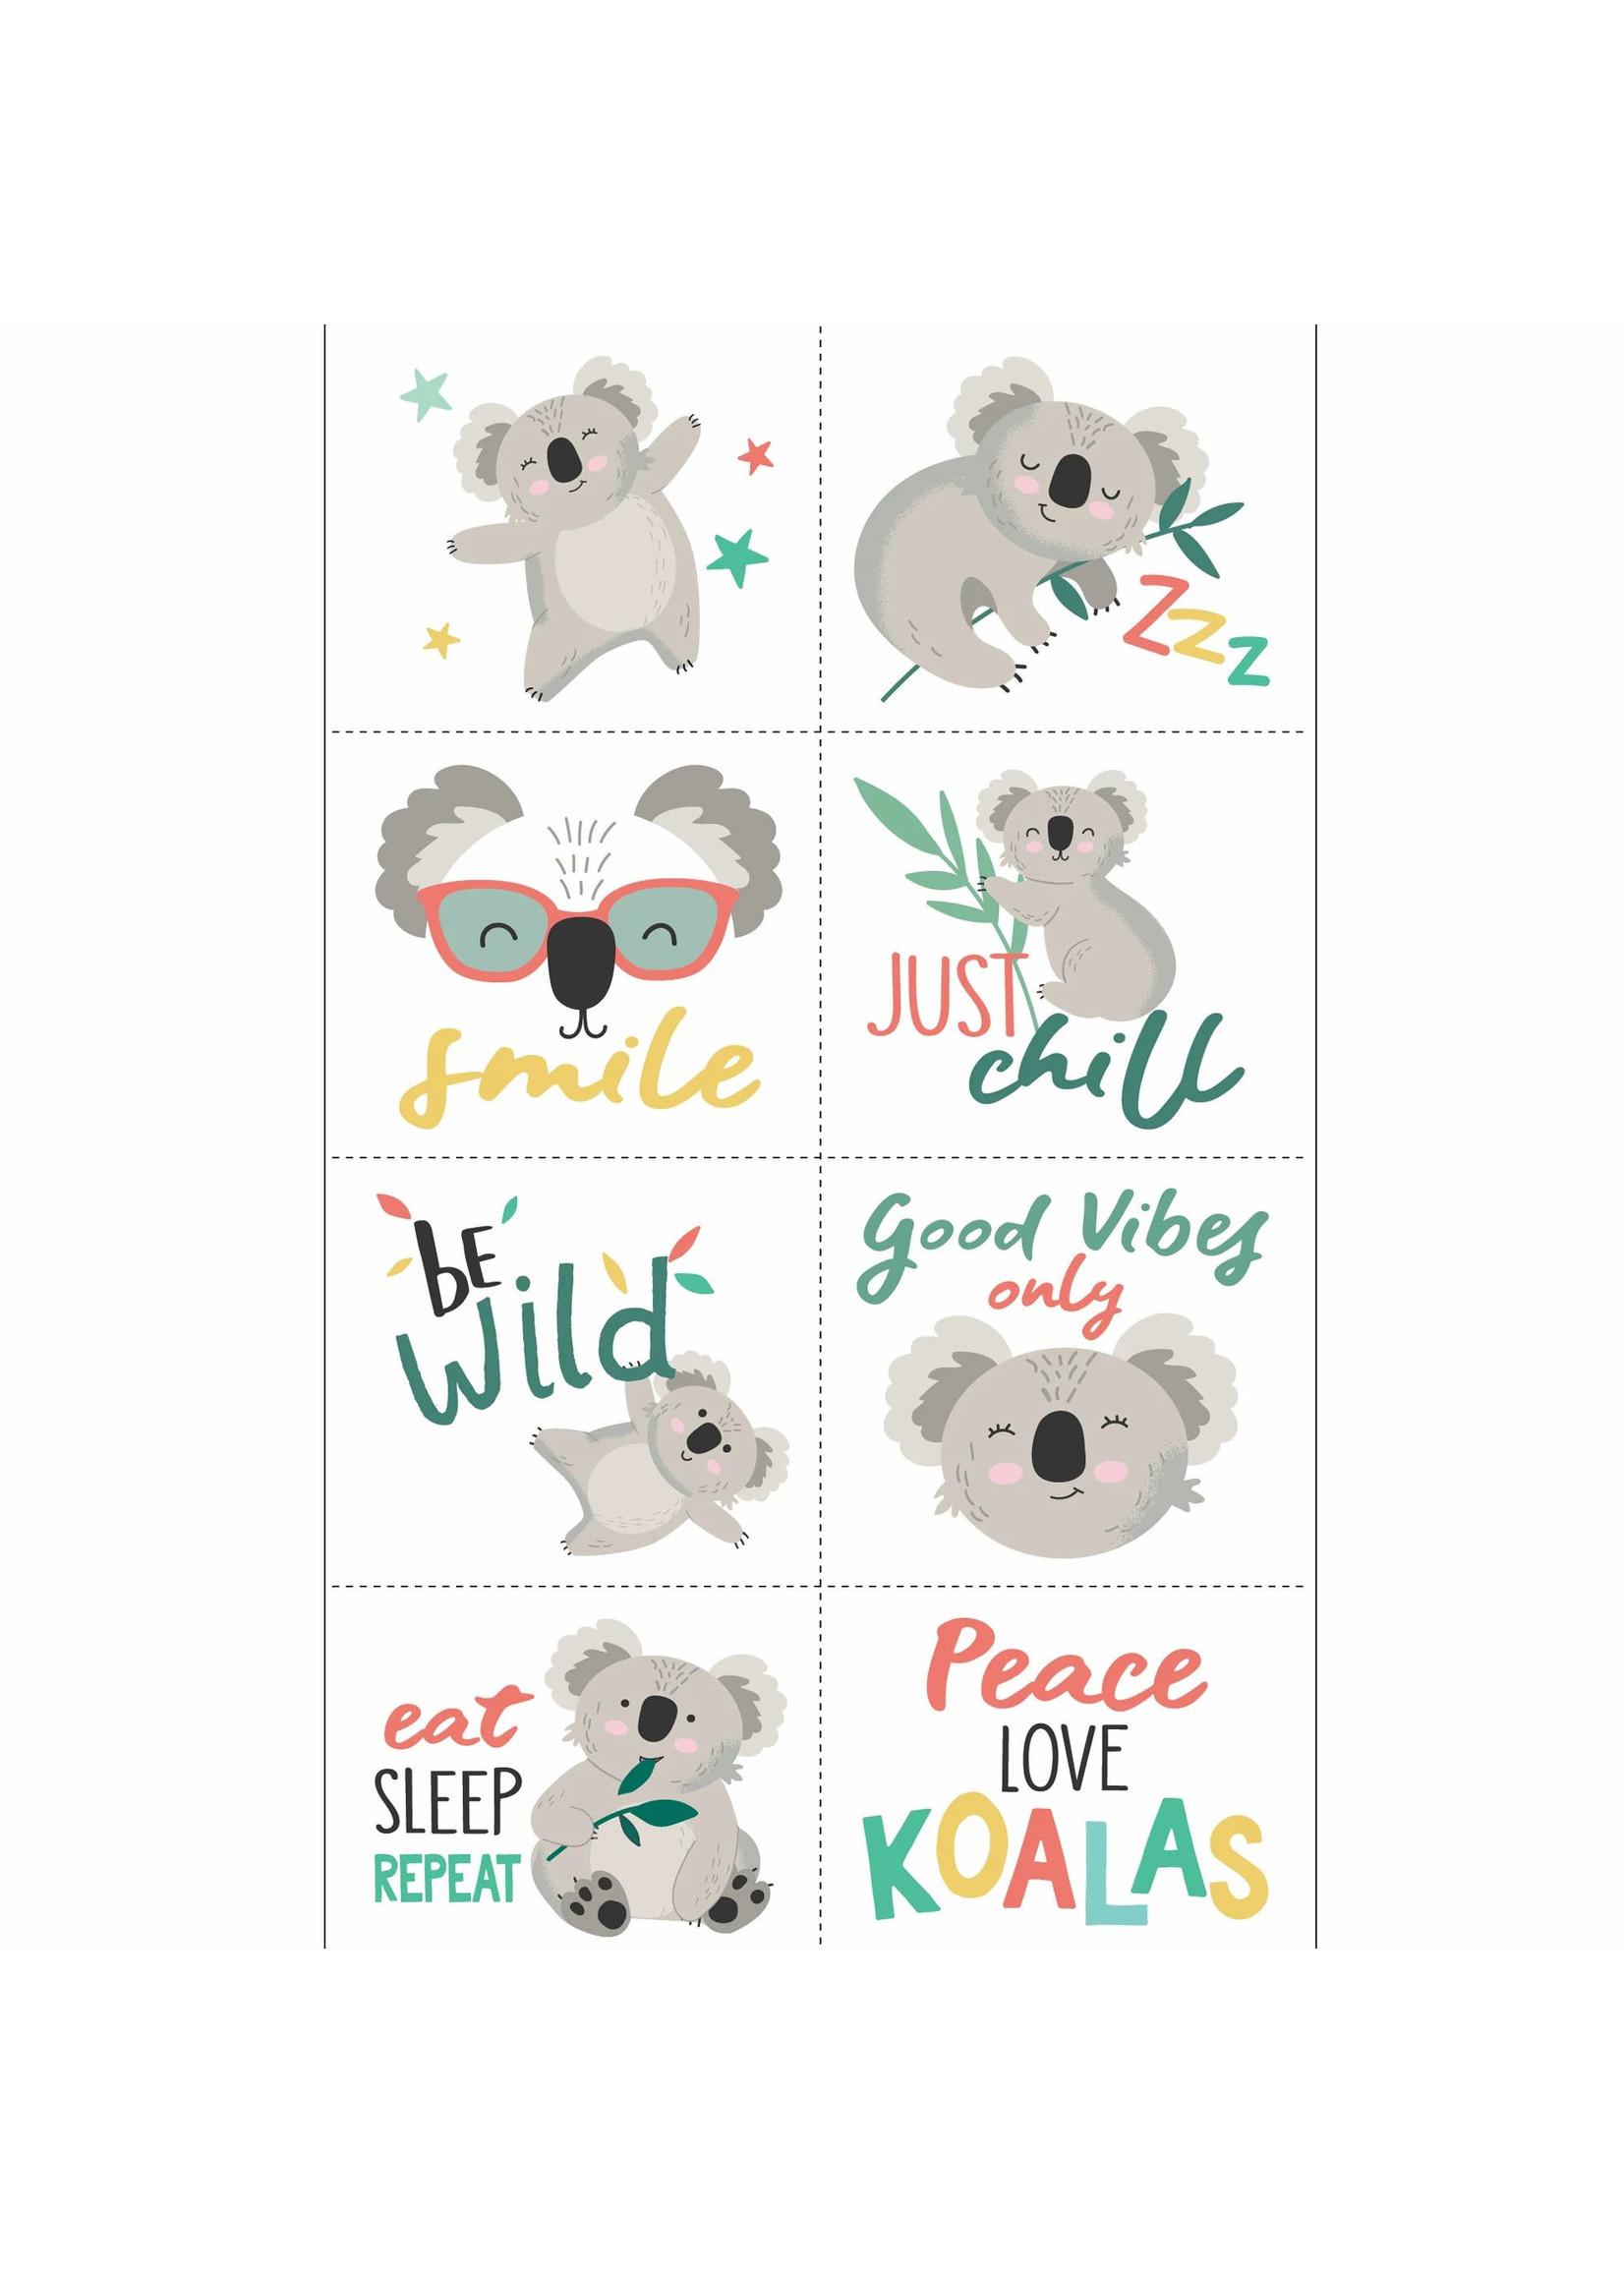 Koala Tattoos